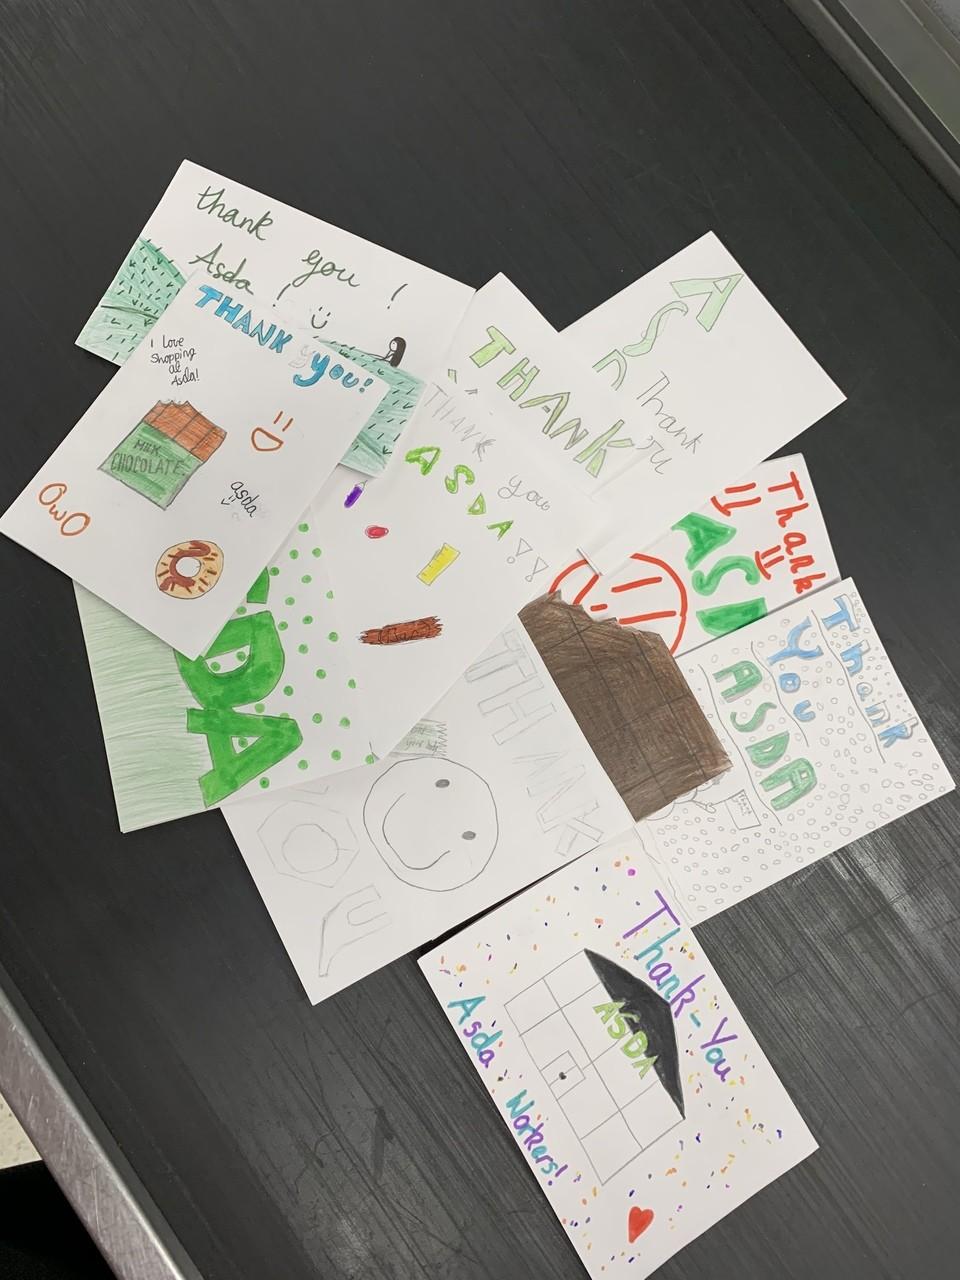 Thank you cards ❤️ | Asda Tain